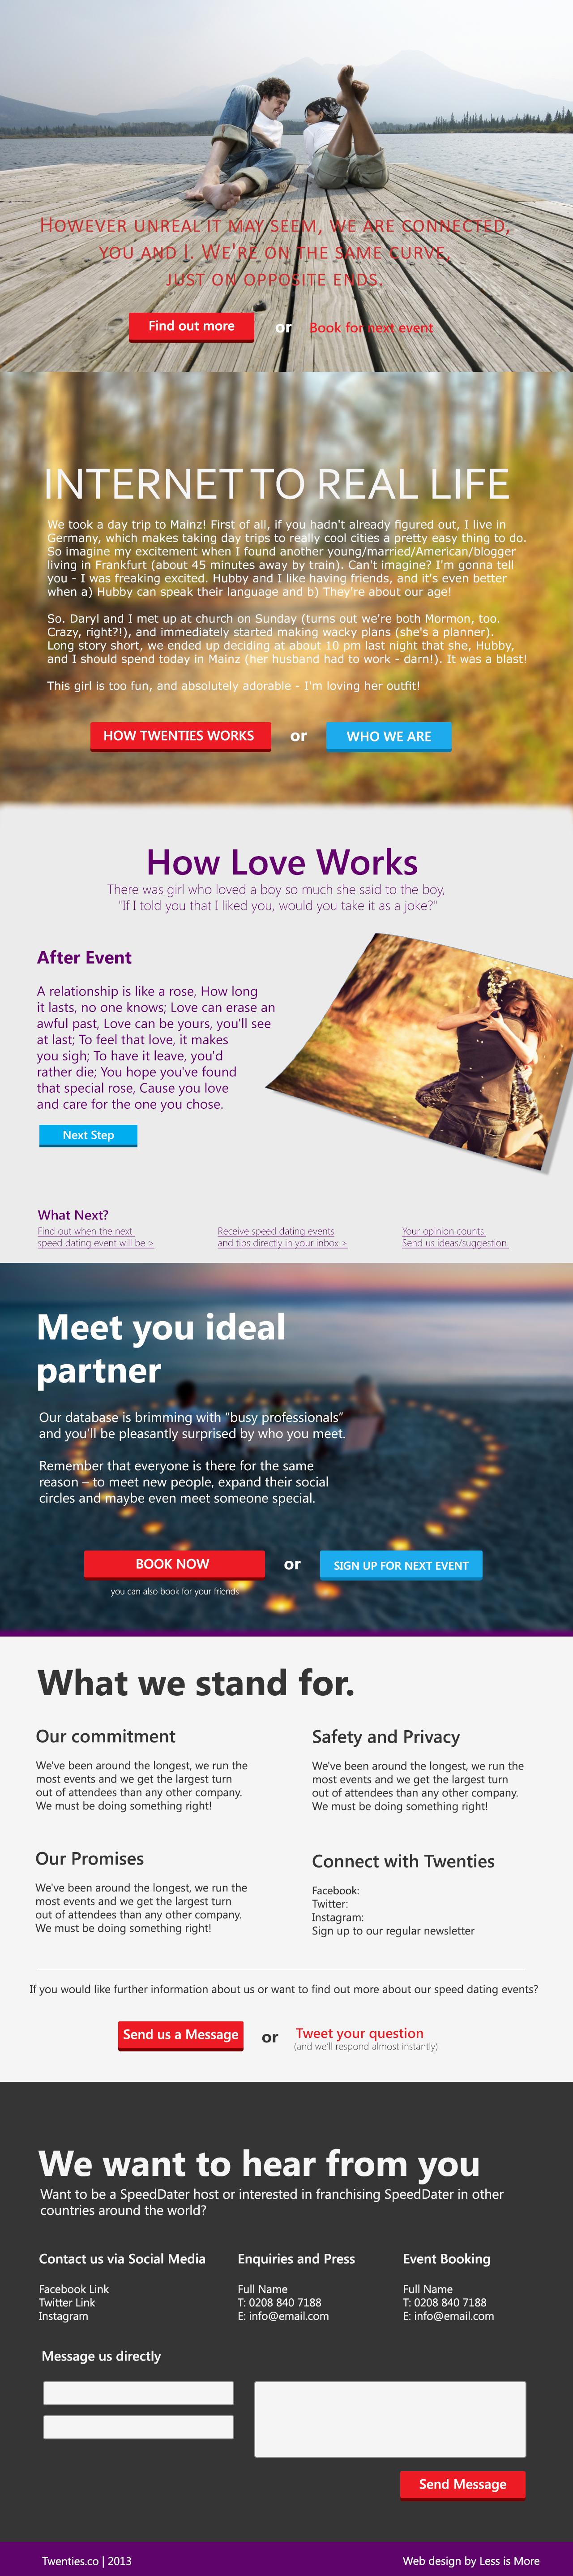 best open line for online dating